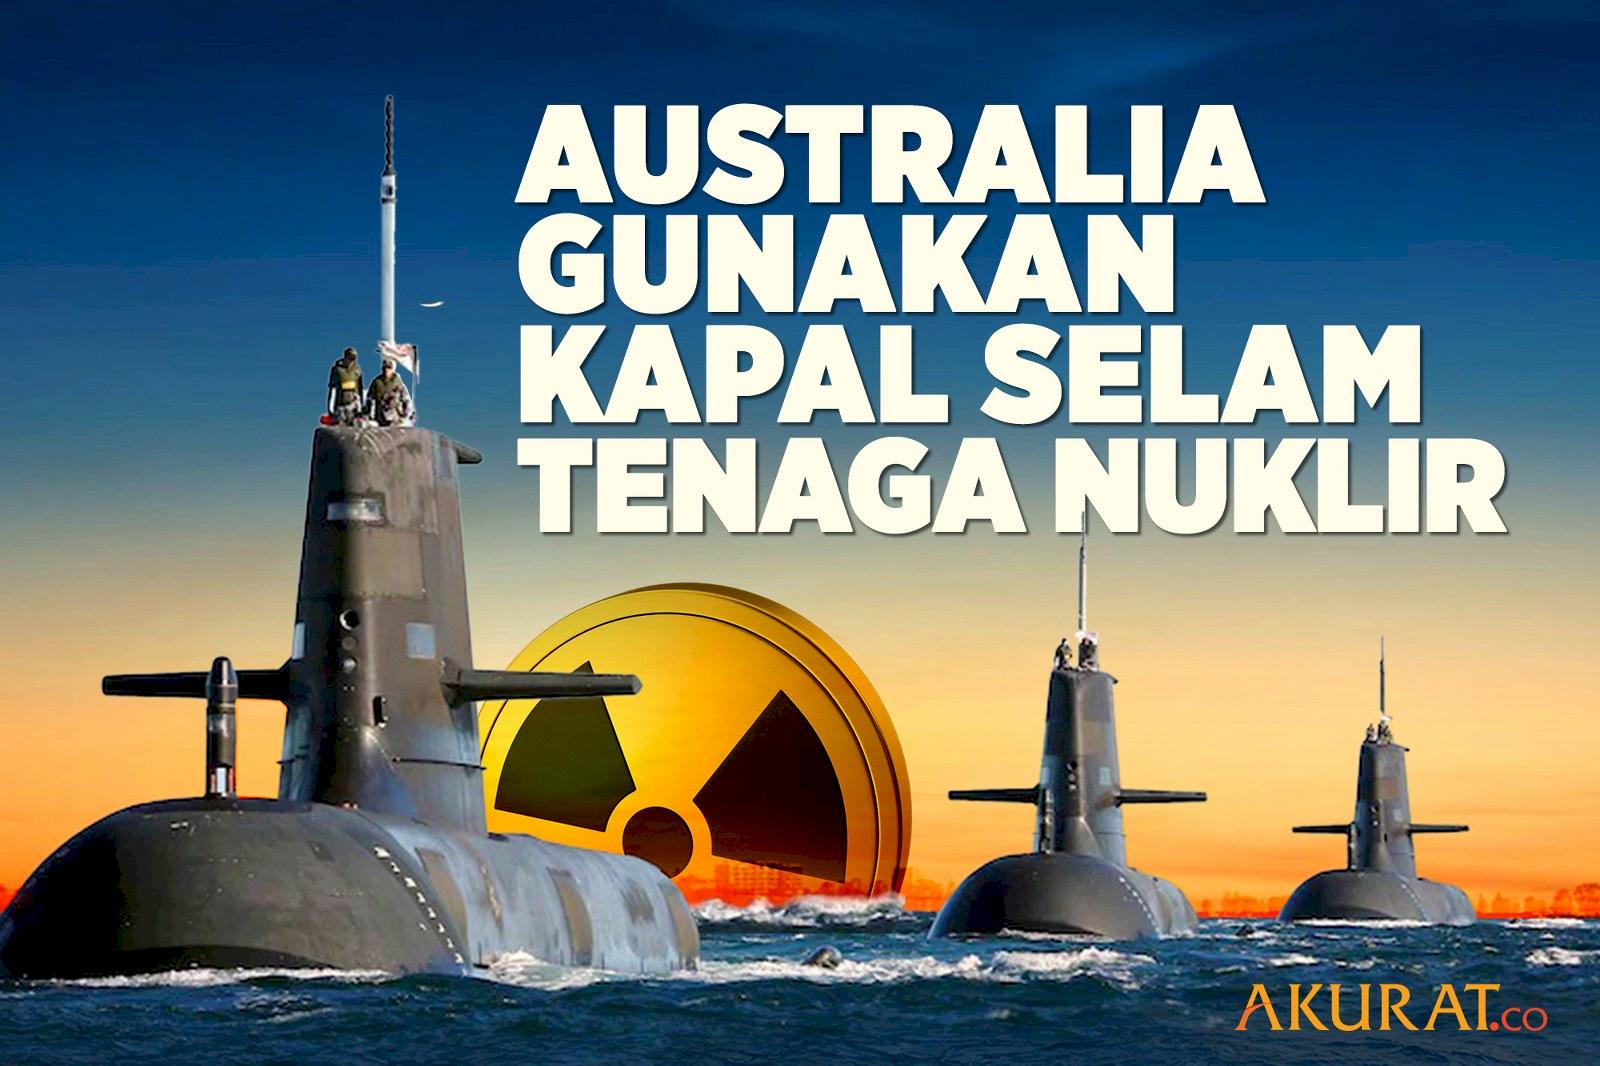 Australia Gunakan Kapal Selam Tenaga Nuklir